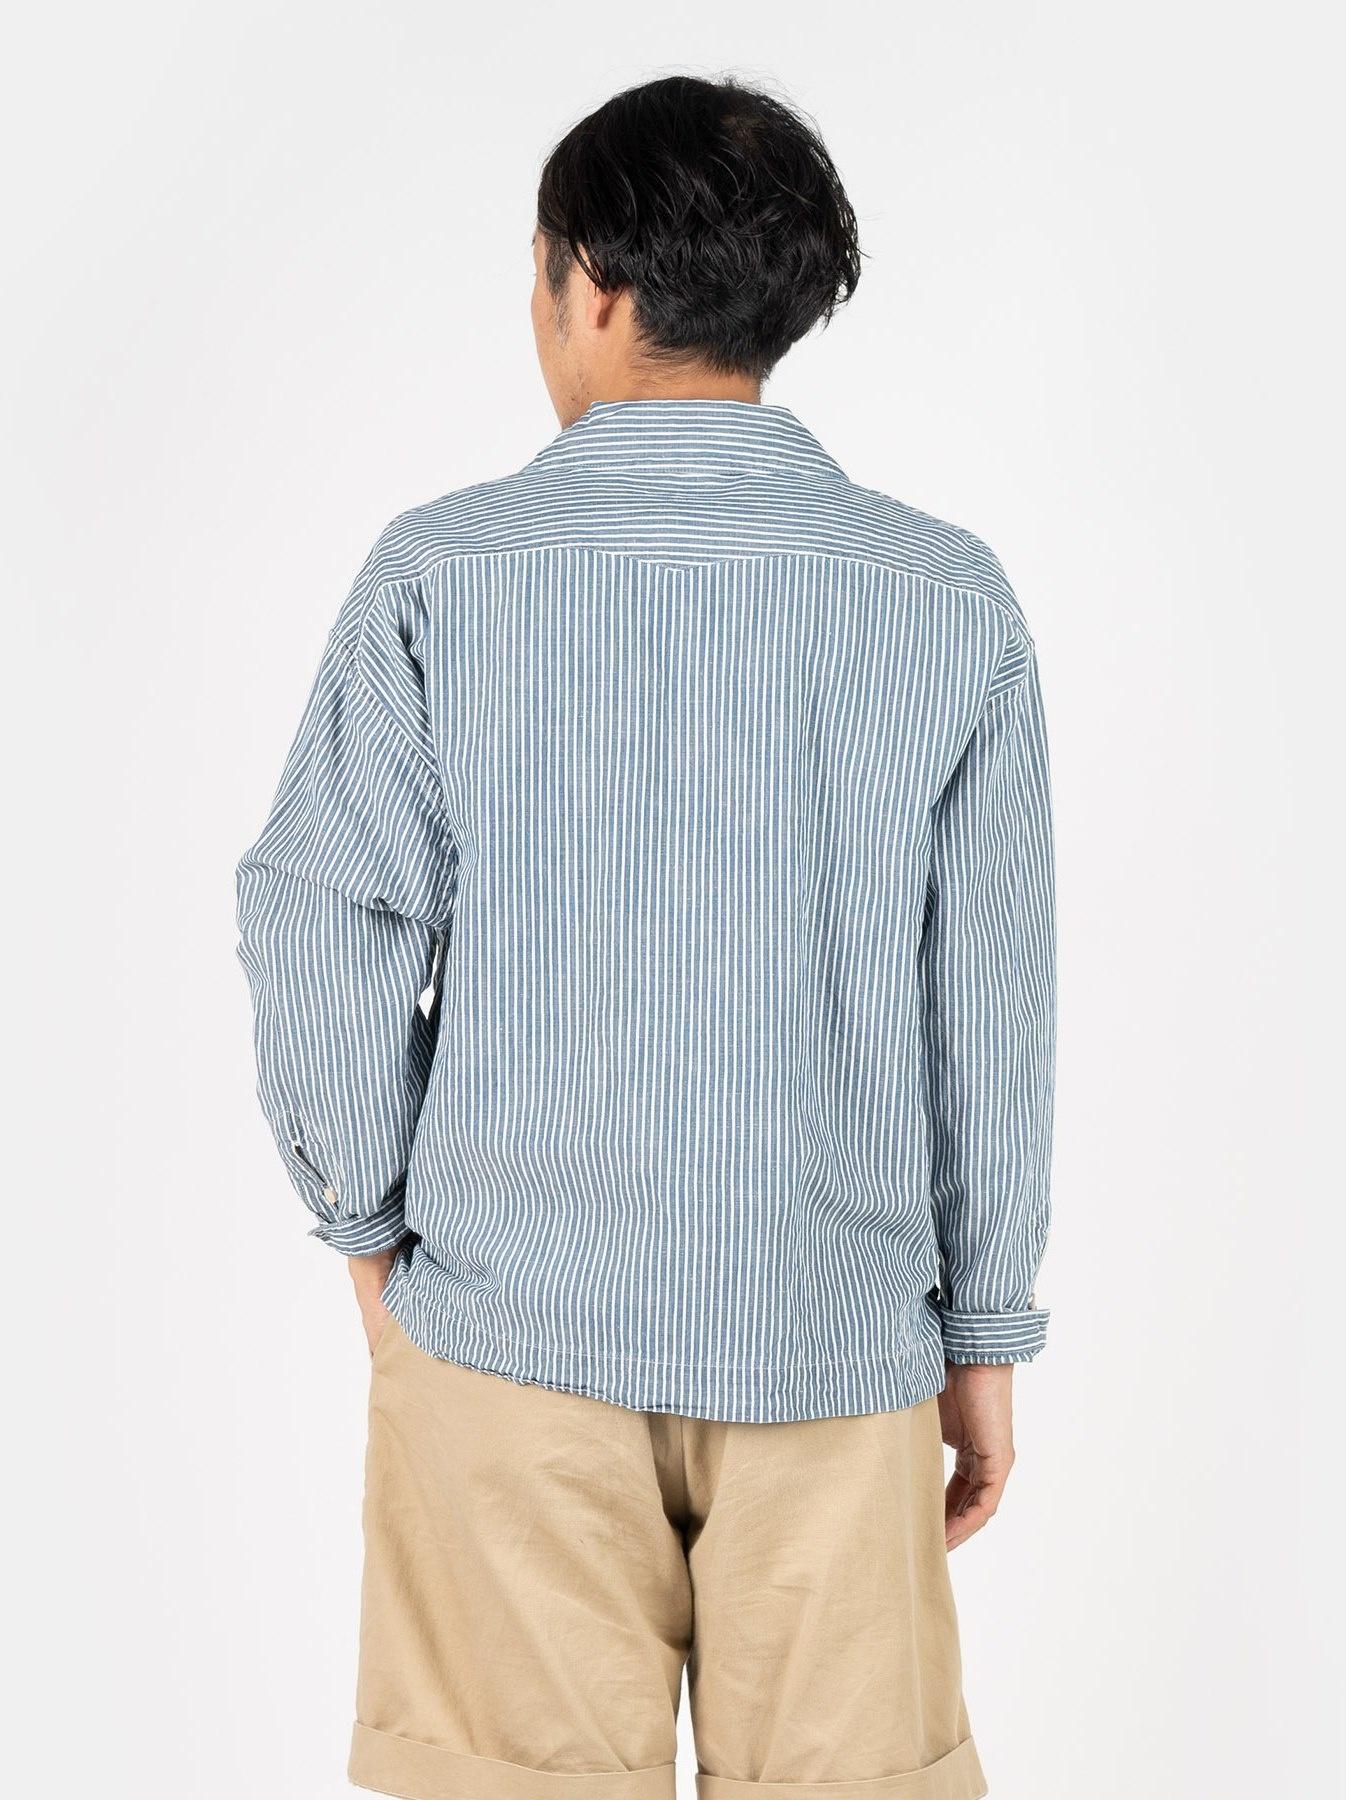 WH Cotton Linen Hickory Umahiko Pullover Shirt-5